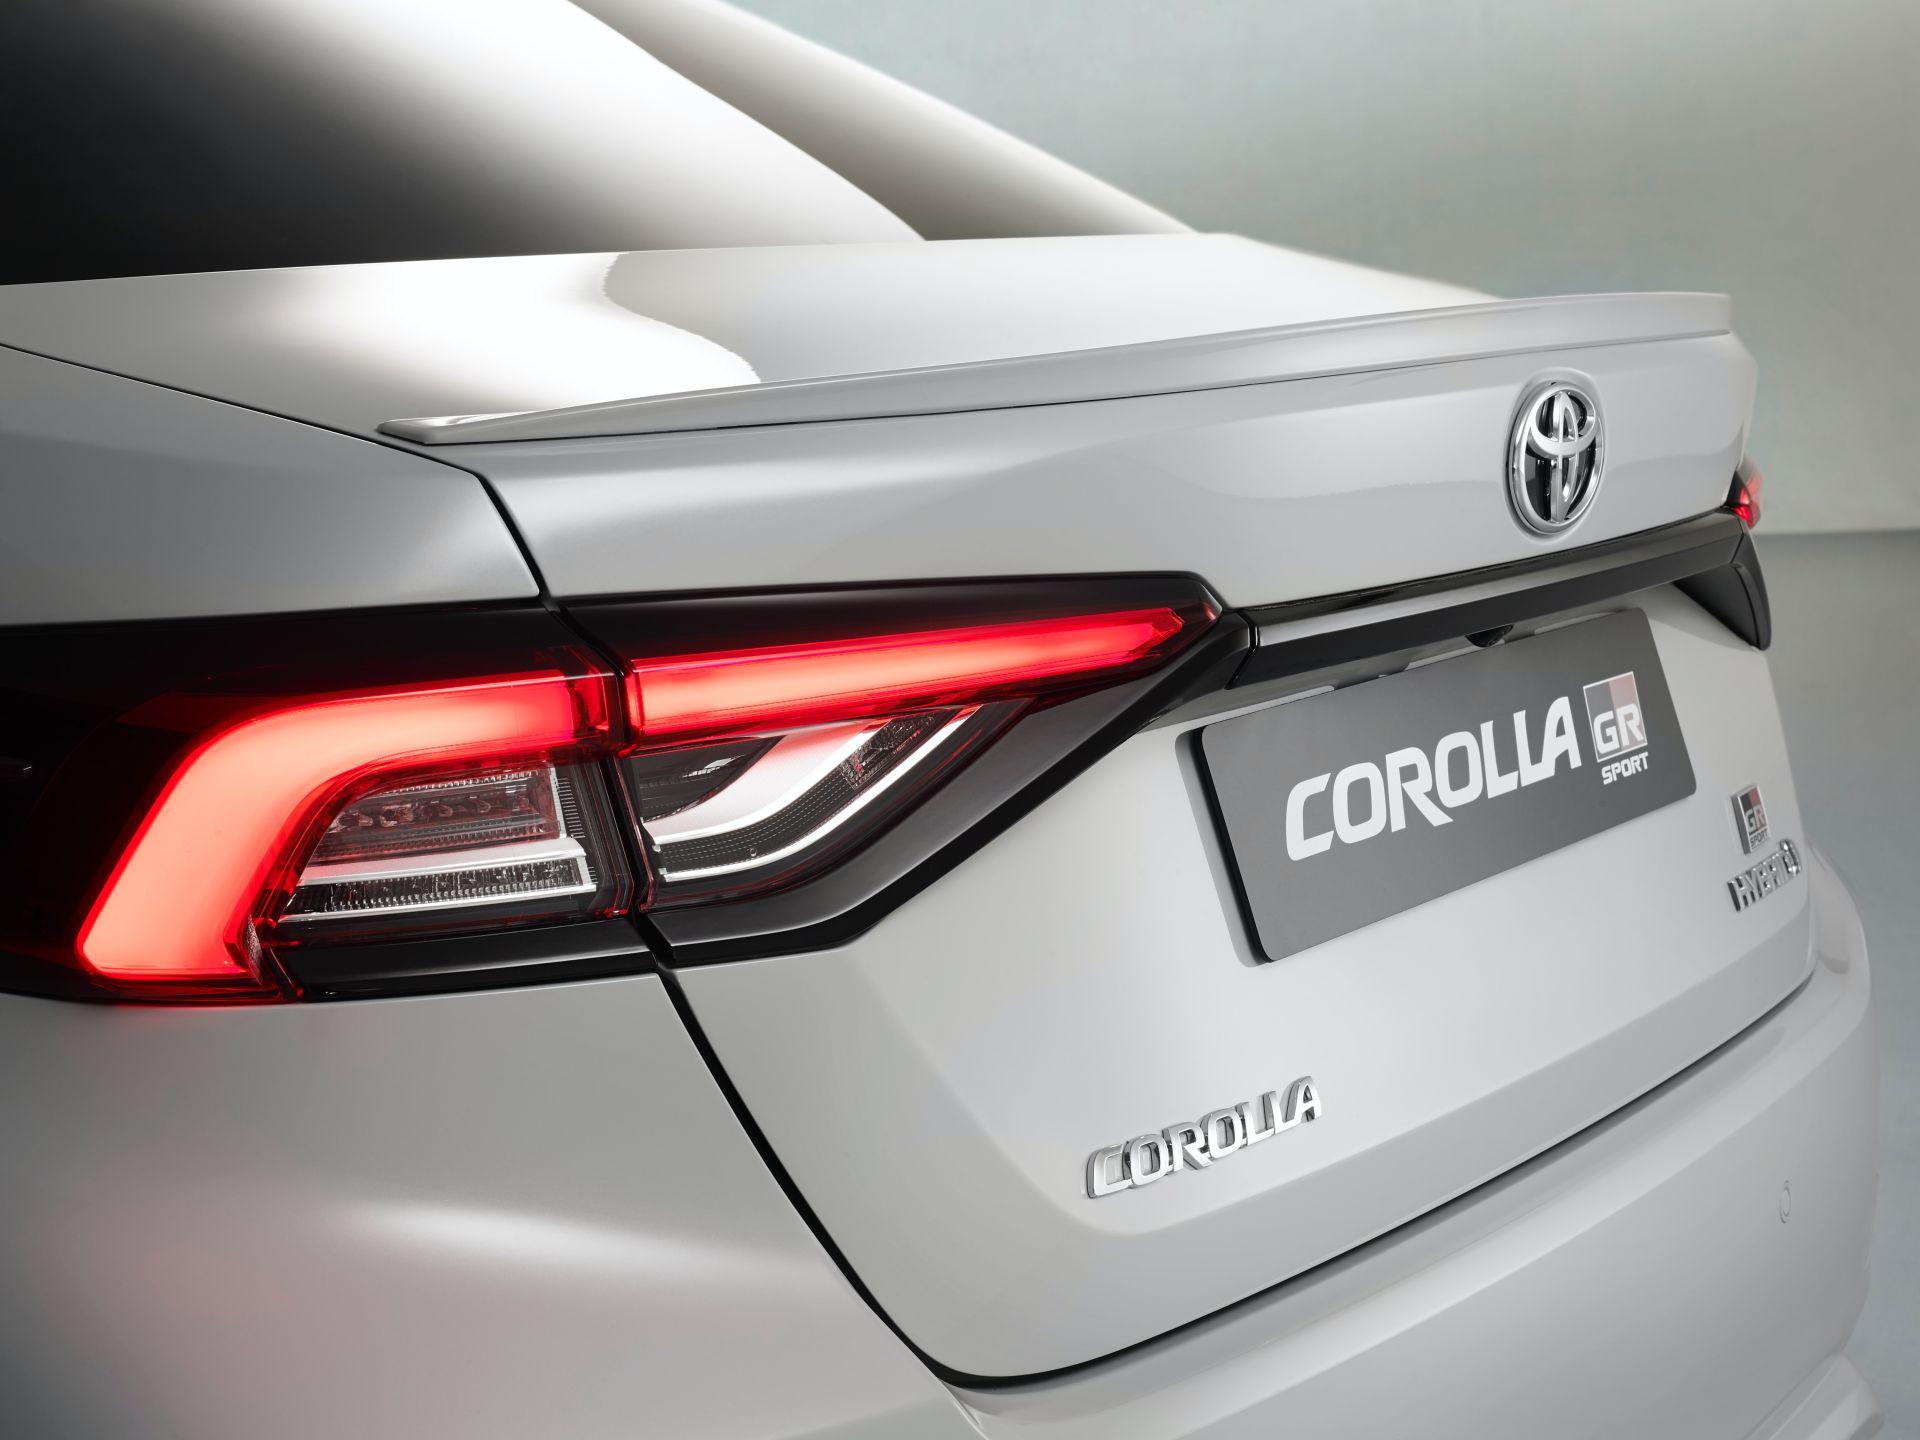 2021 Toyota Corolla Sedan GR Sport European spec 24